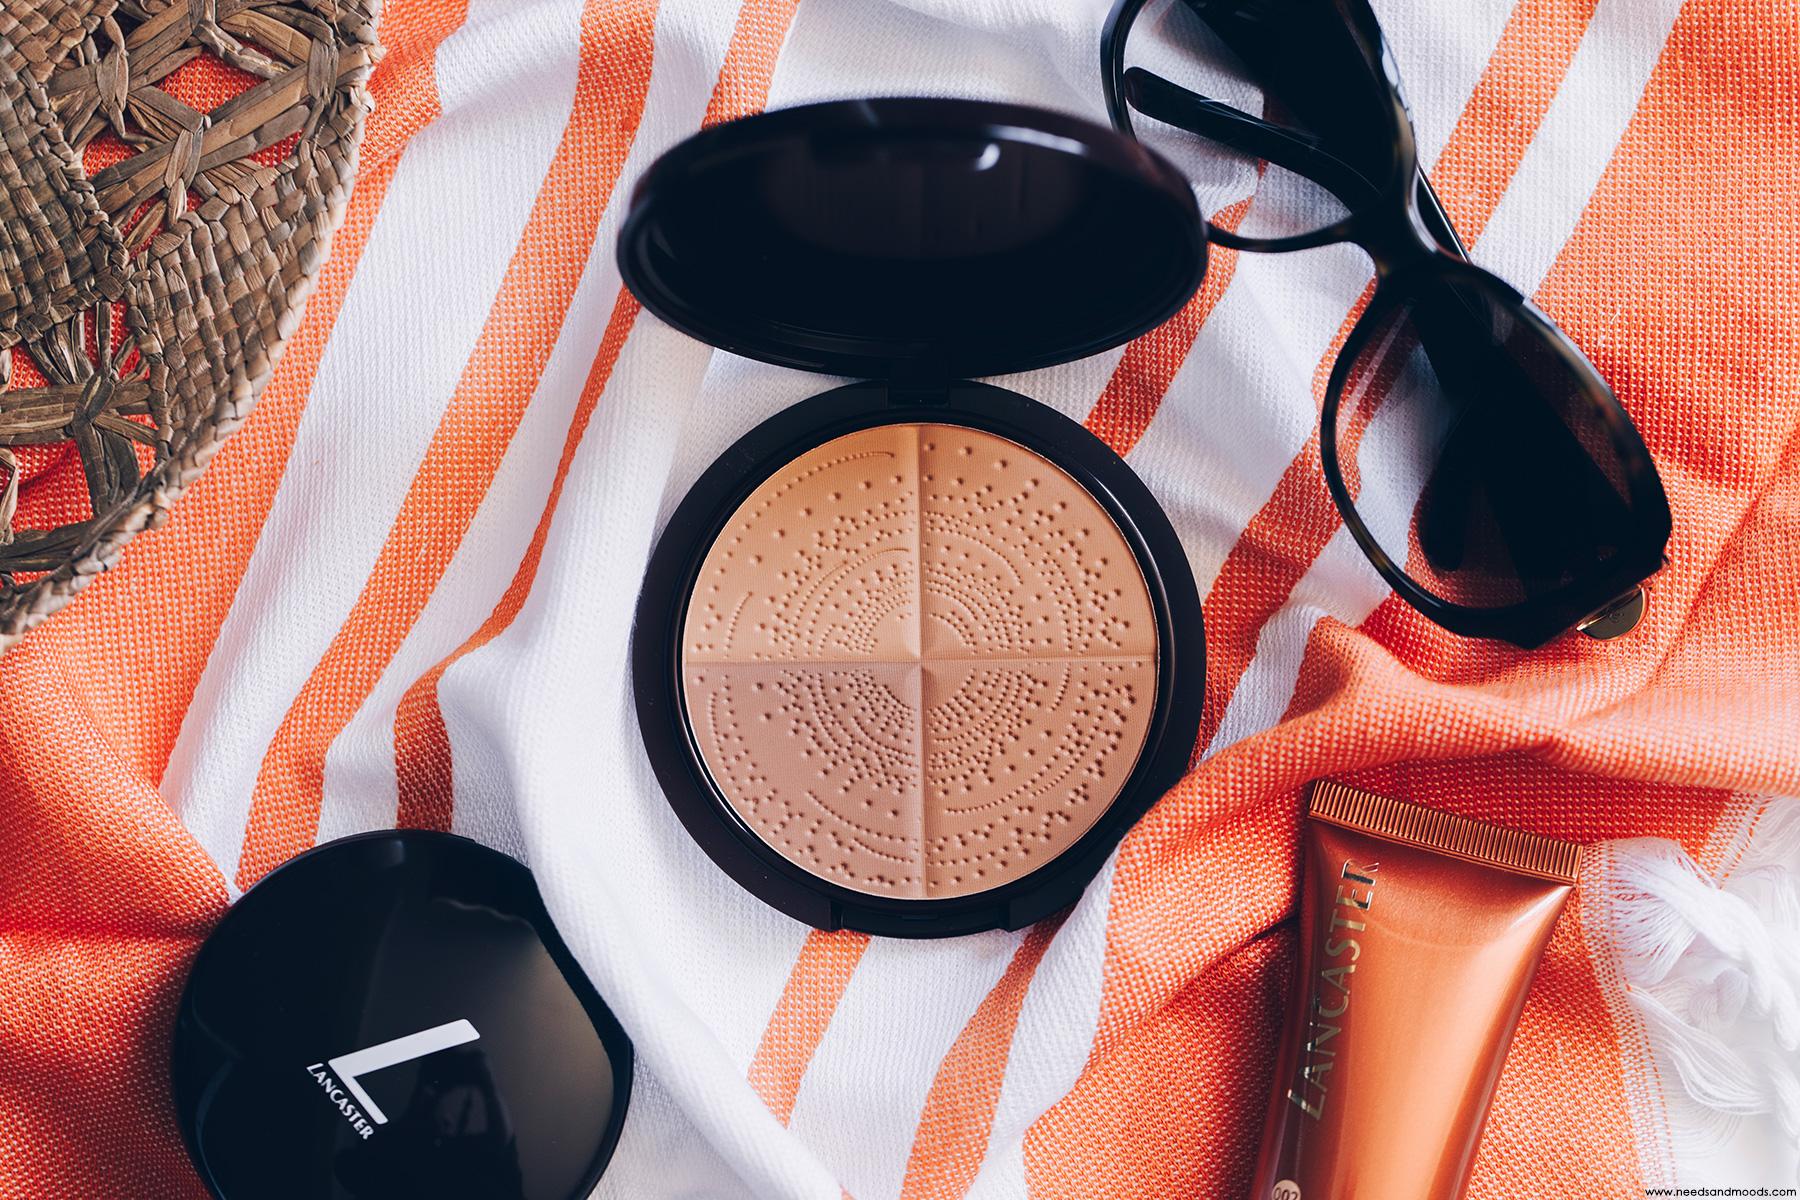 lancaster sun 365 sun make-up poudre bronzante protectrice spf 10